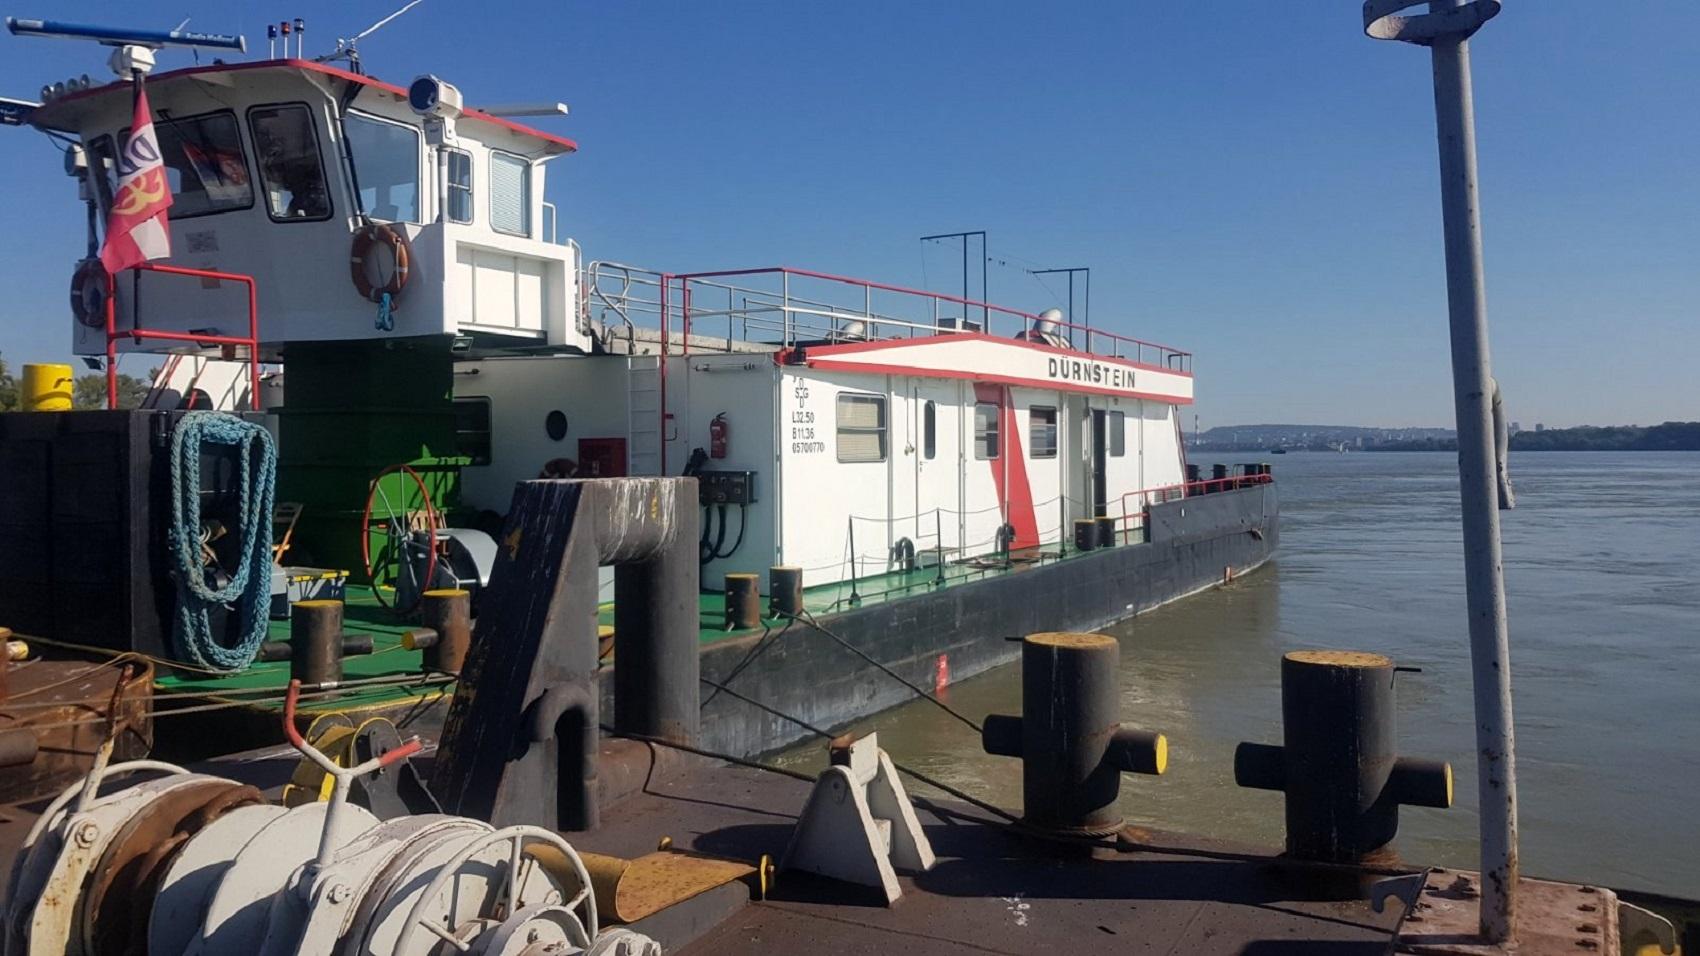 moldavski brod na kome je pronadjena neprjavljena nafta